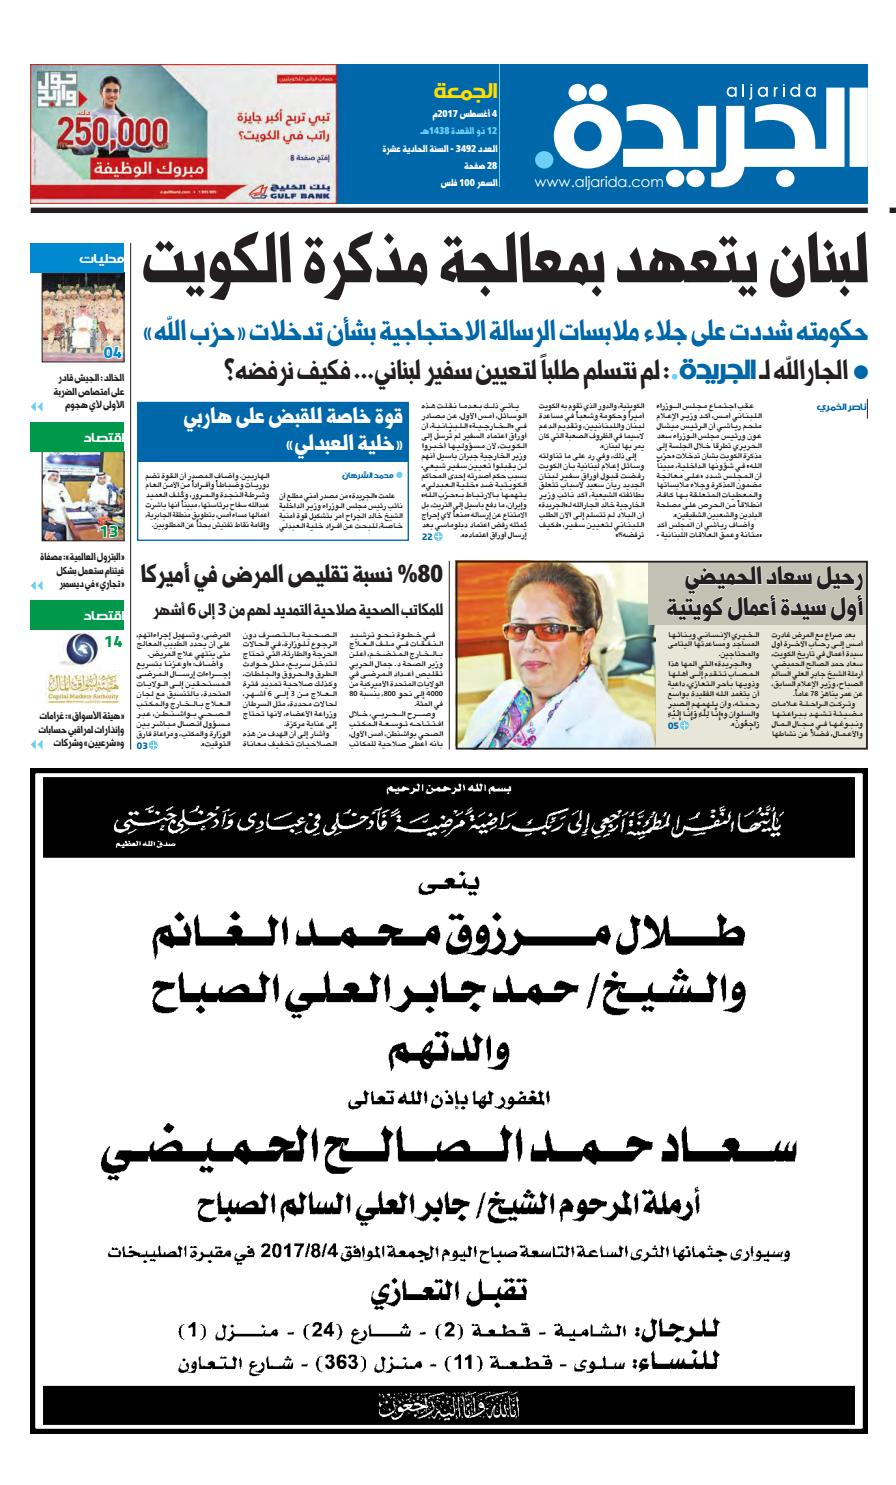 4d0a19174b608 عدد الجريدة الجمعة 4 أغسطس 2017 by Aljarida Newspaper - issuu